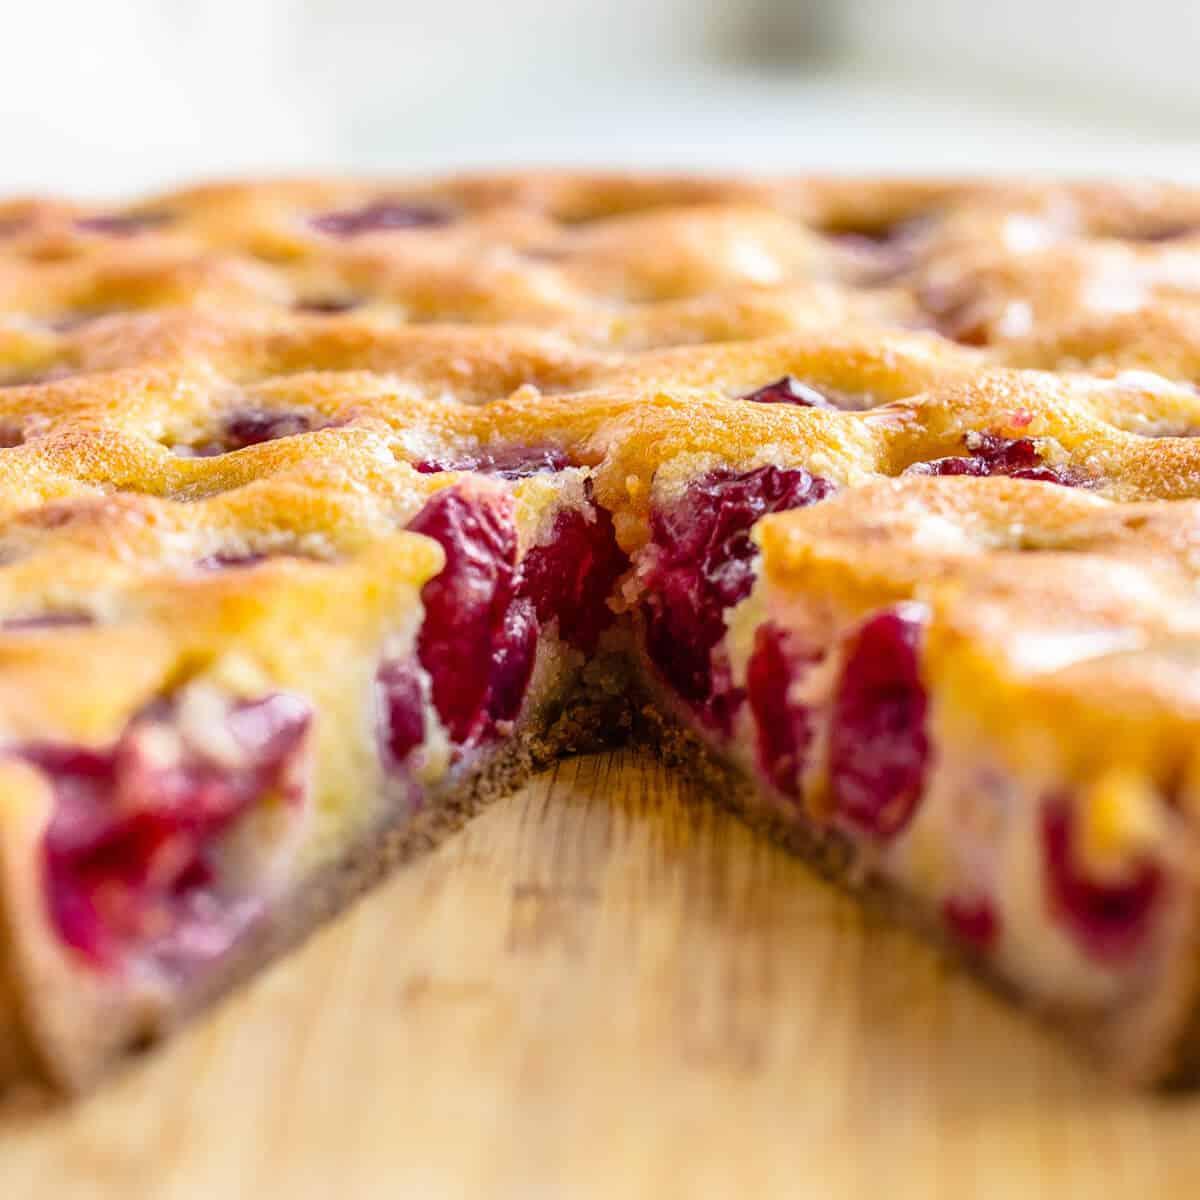 cross section of cherry tart on wooden board.